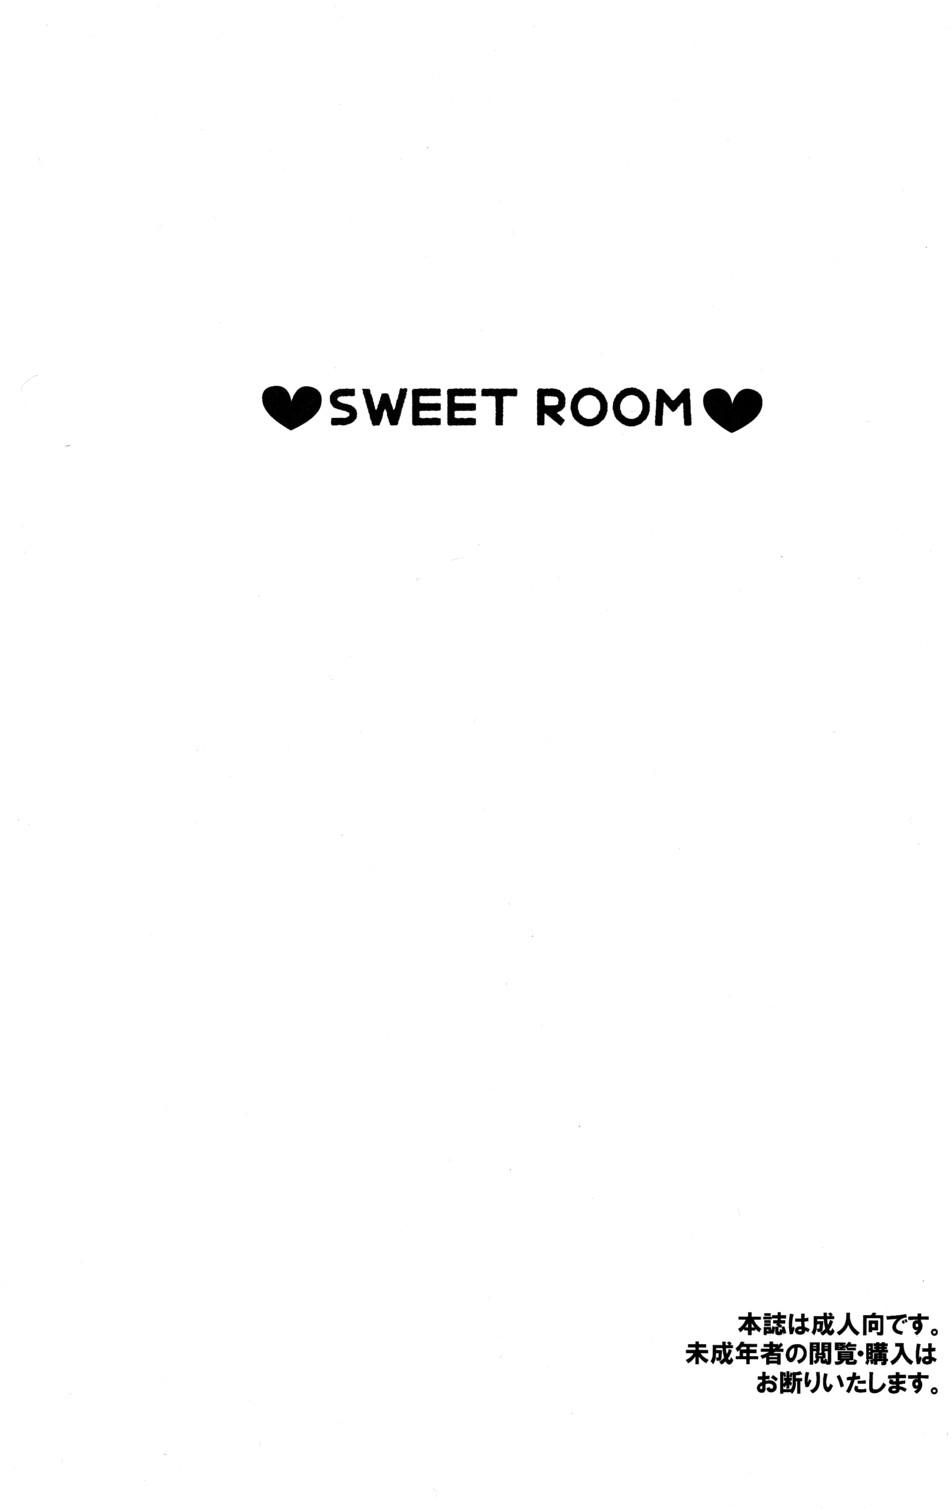 SWEET ROOM 3